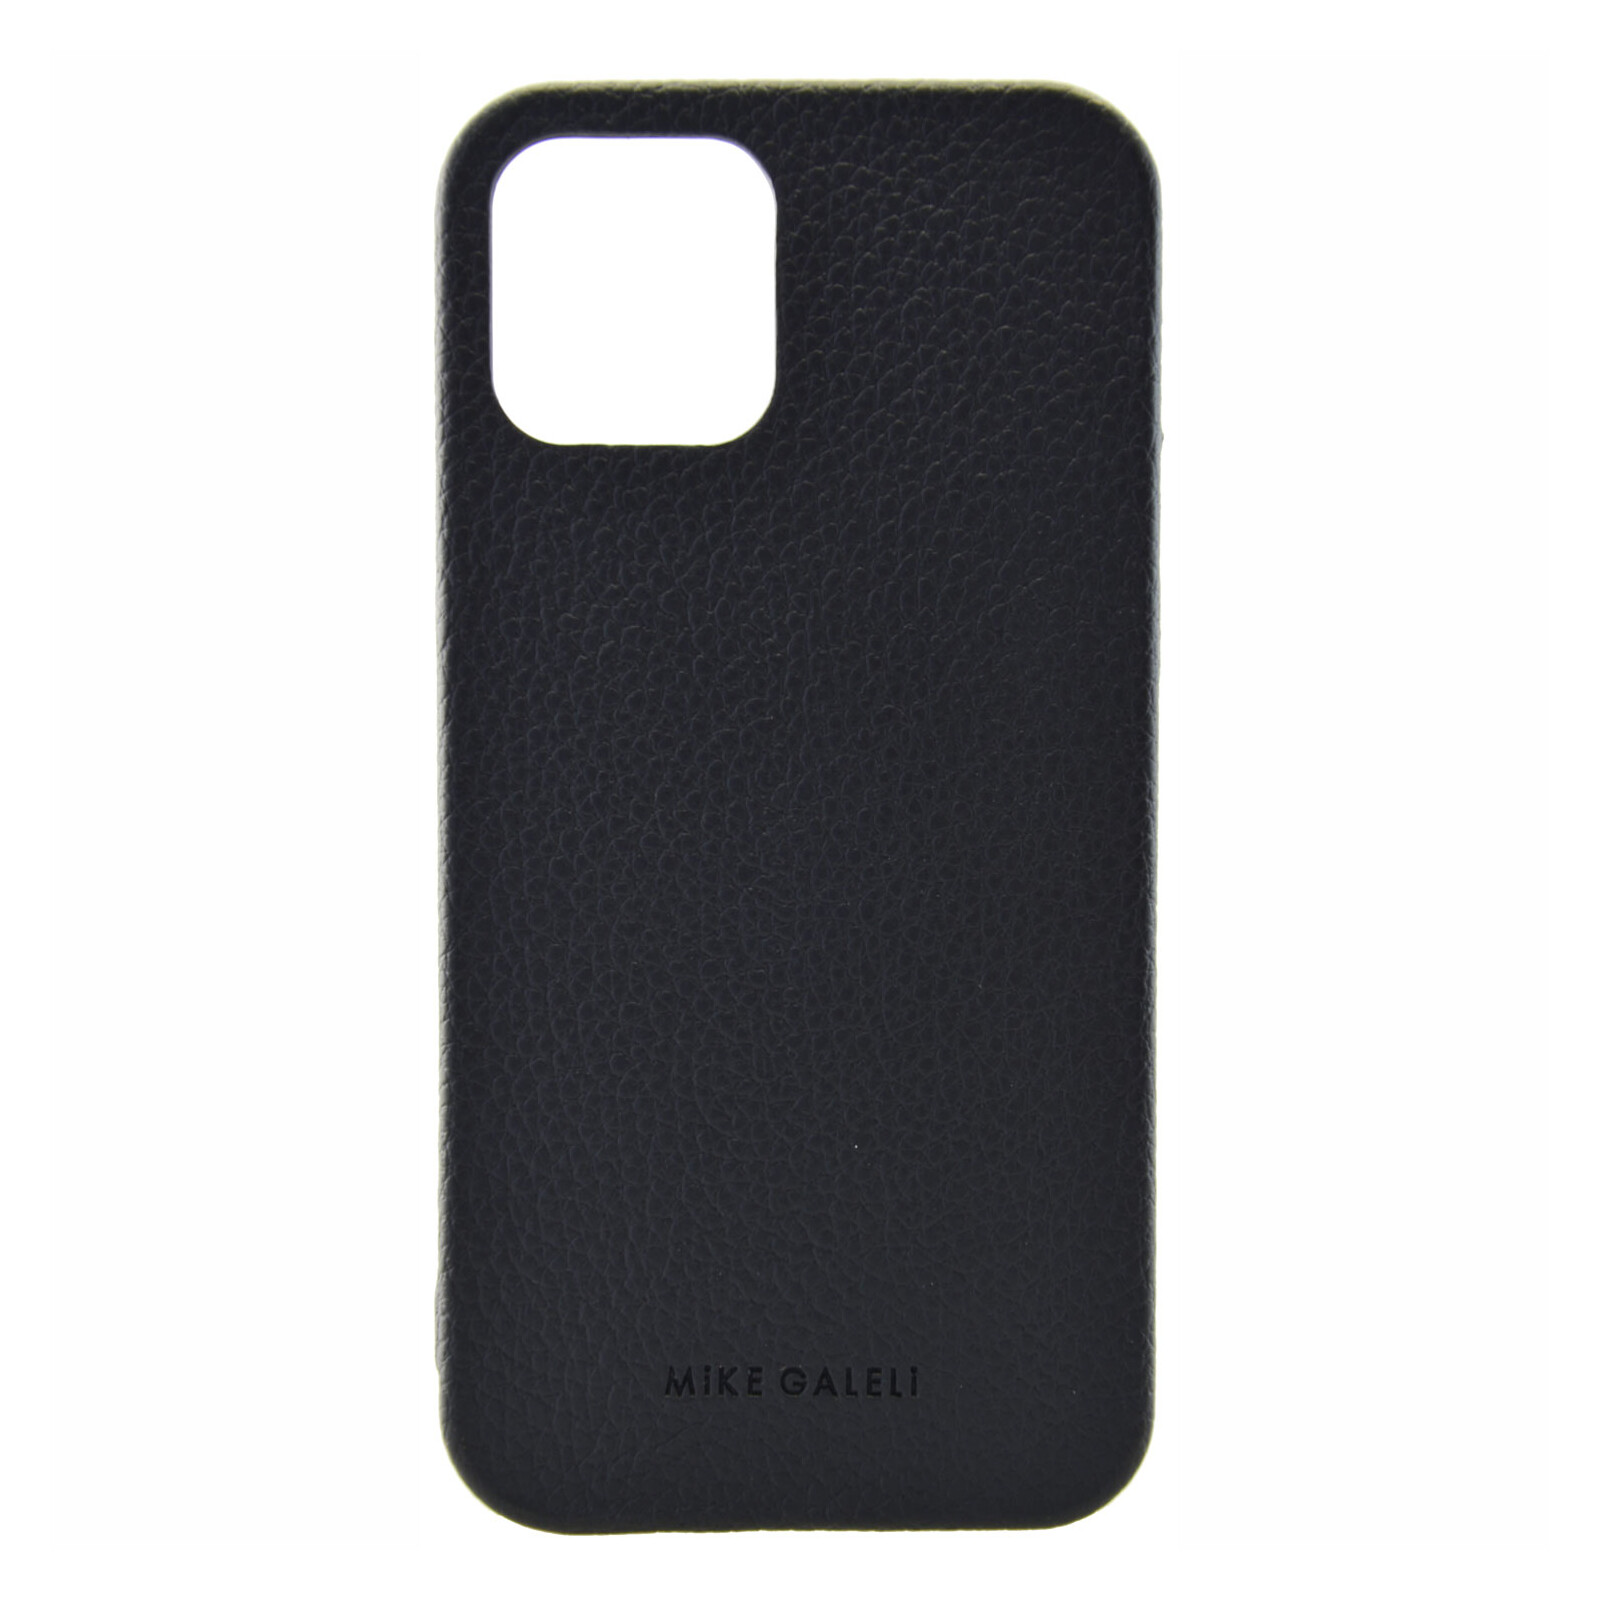 Galeli Backcover FINN Apple iPhone 12 Pro Max schwarz